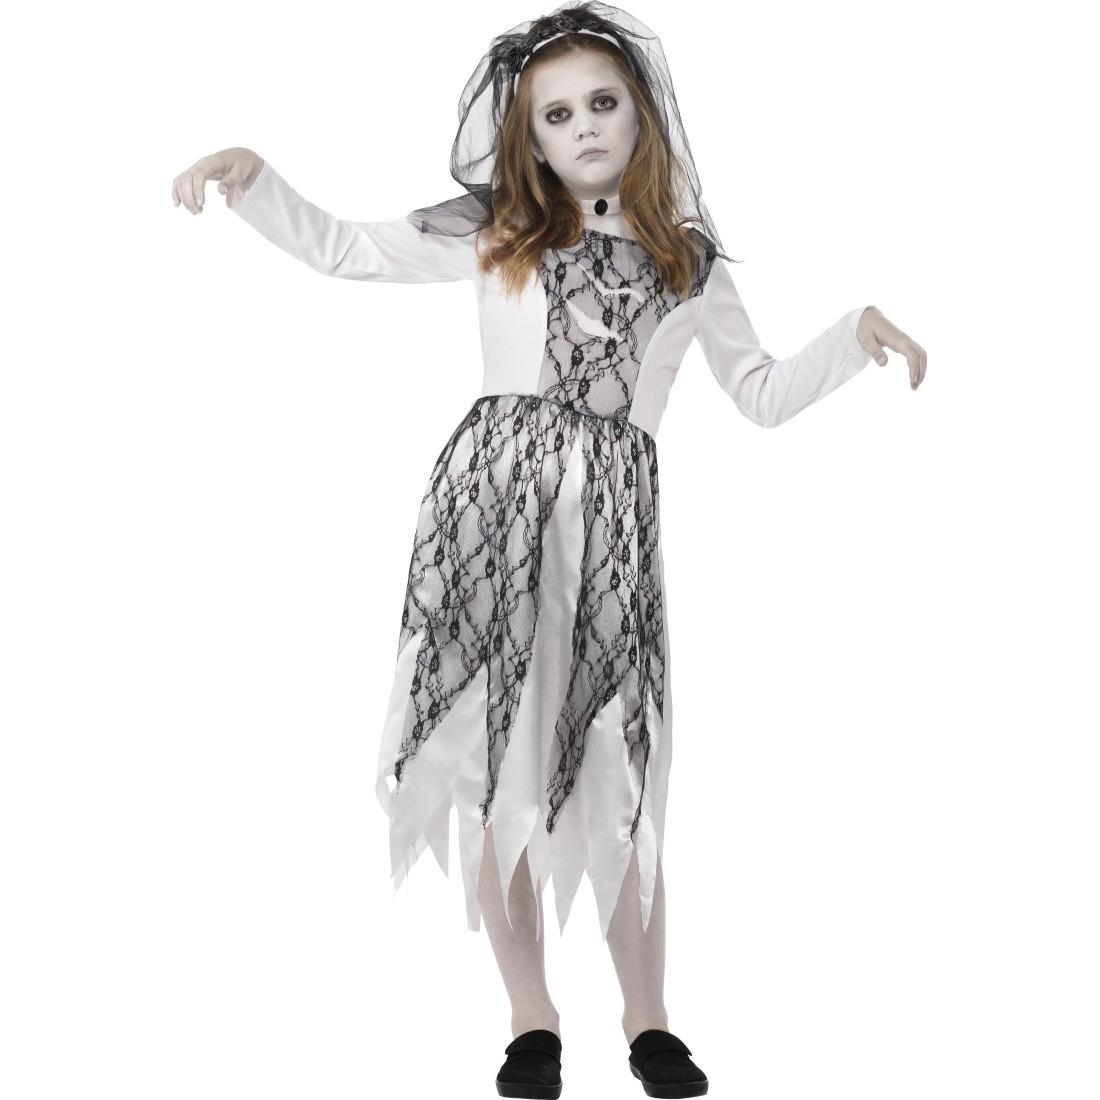 halloween kostüm braut geisterbraut kinderkostüm, 24,99 ¬